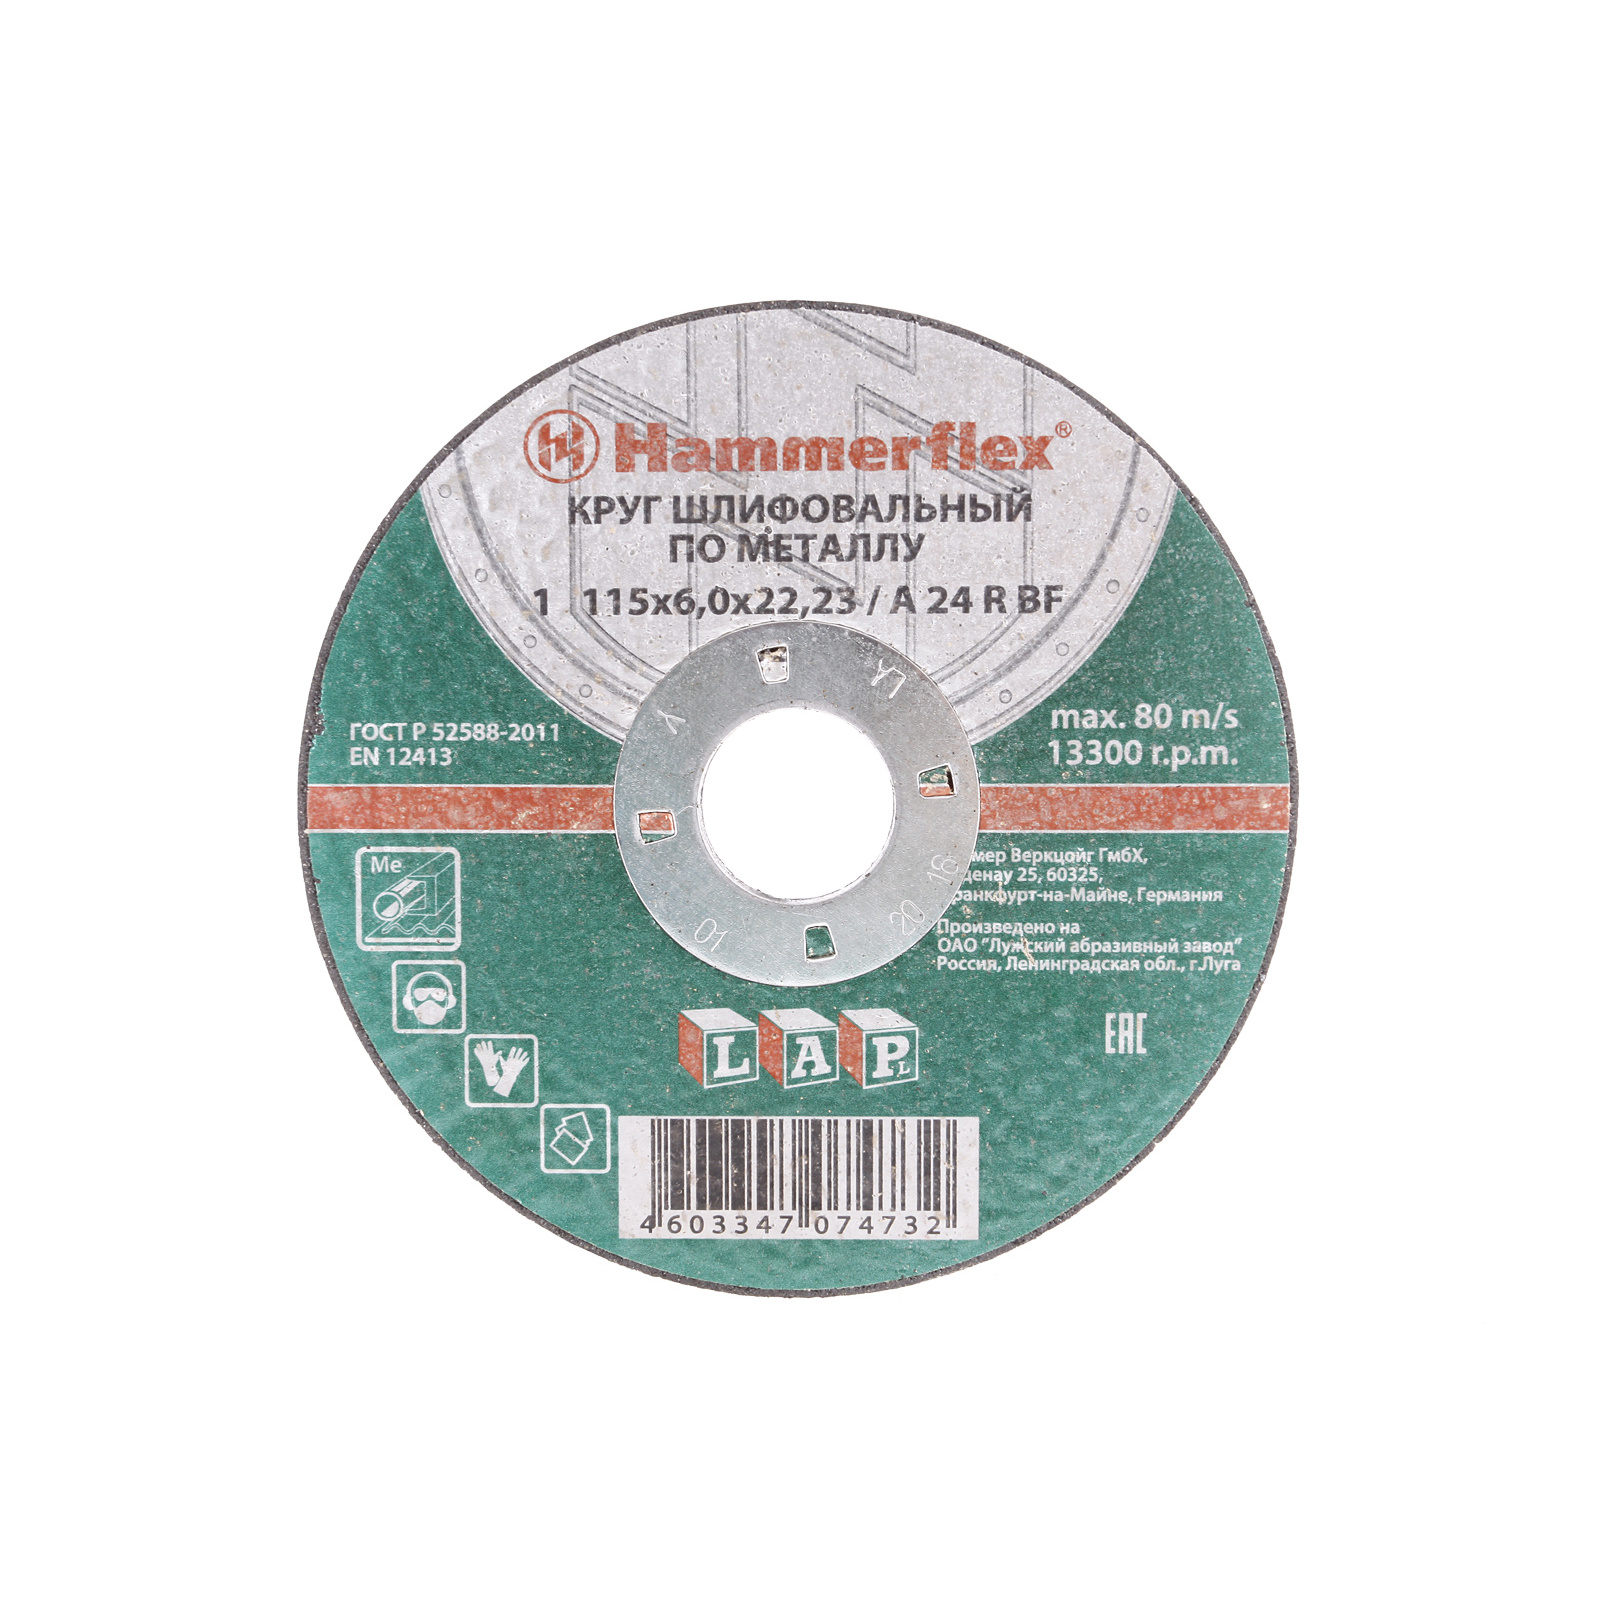 Circle Grinding HAMMER 115х6х22мм 14A Pkg. 10 PCs